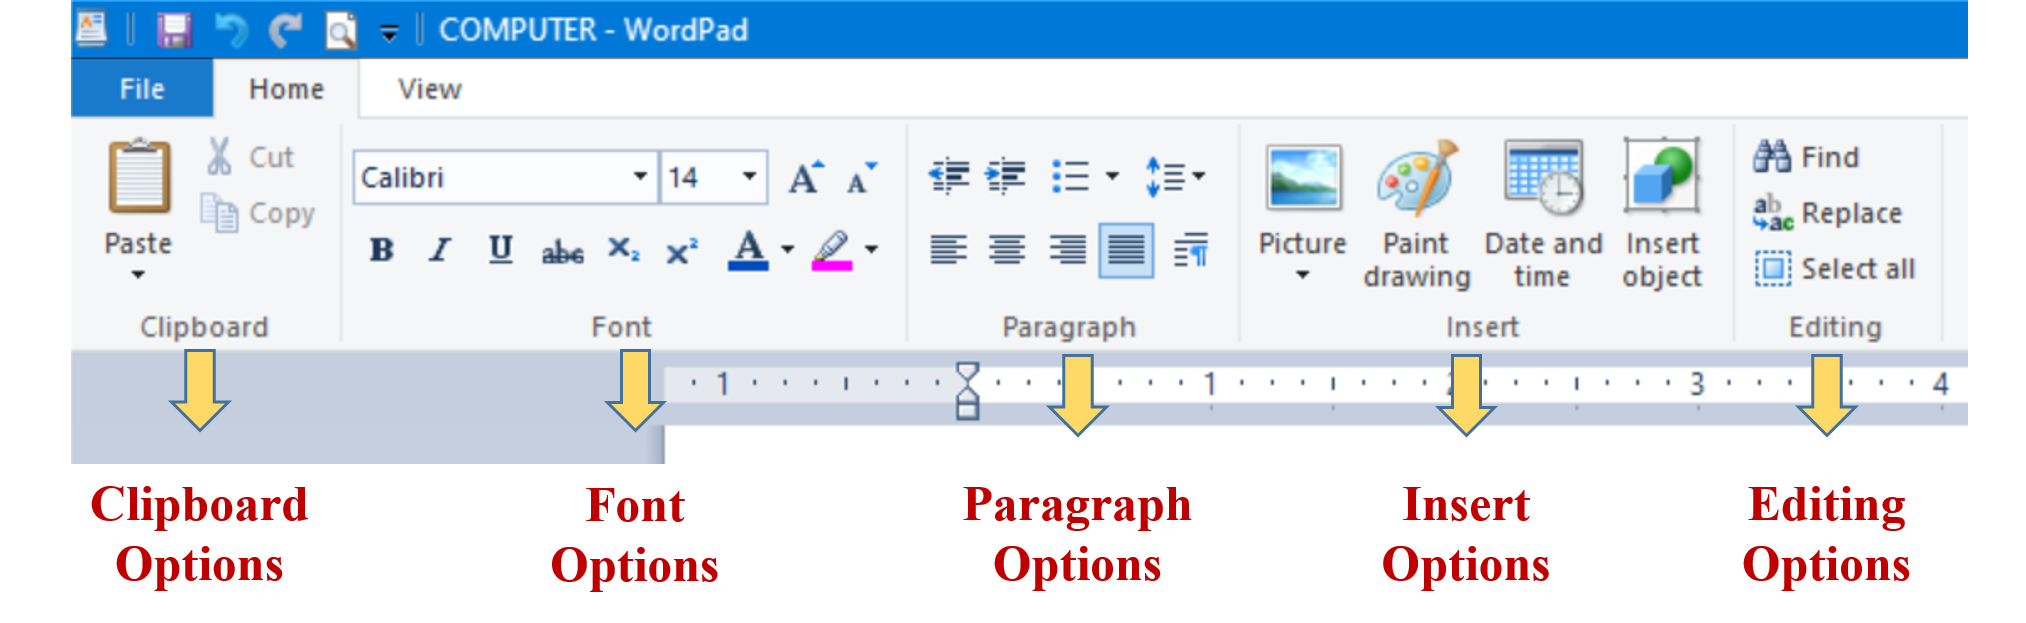 Using Home Tab in WordPad